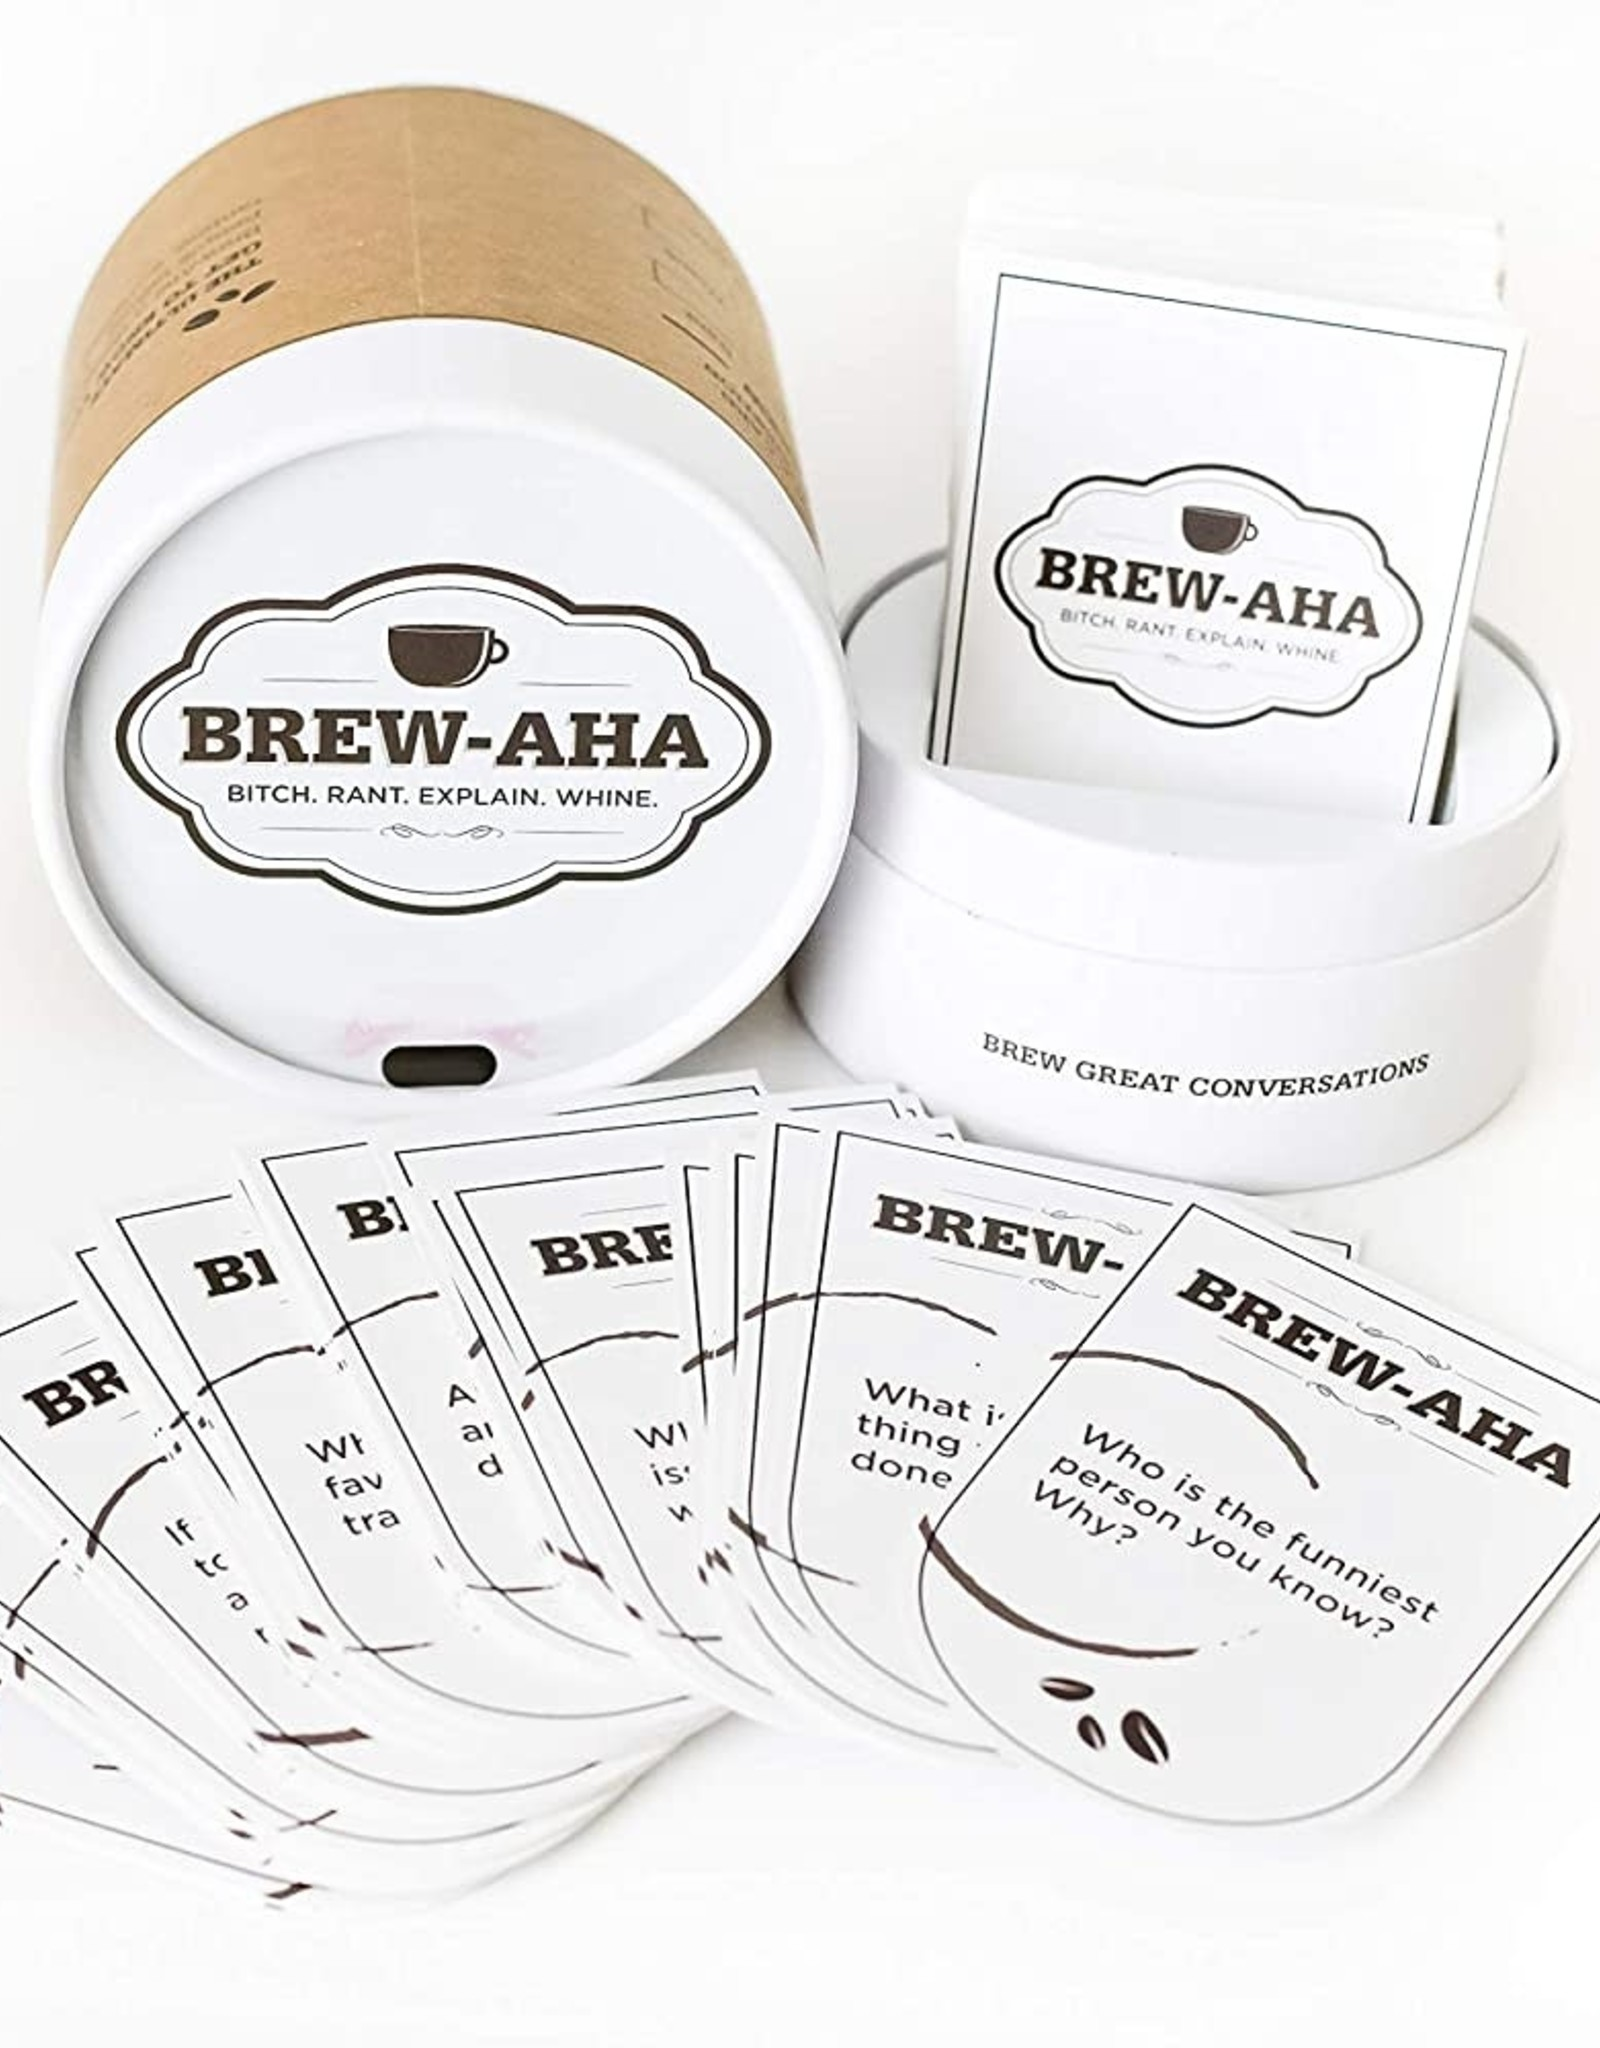 Contender Brands BrewAha